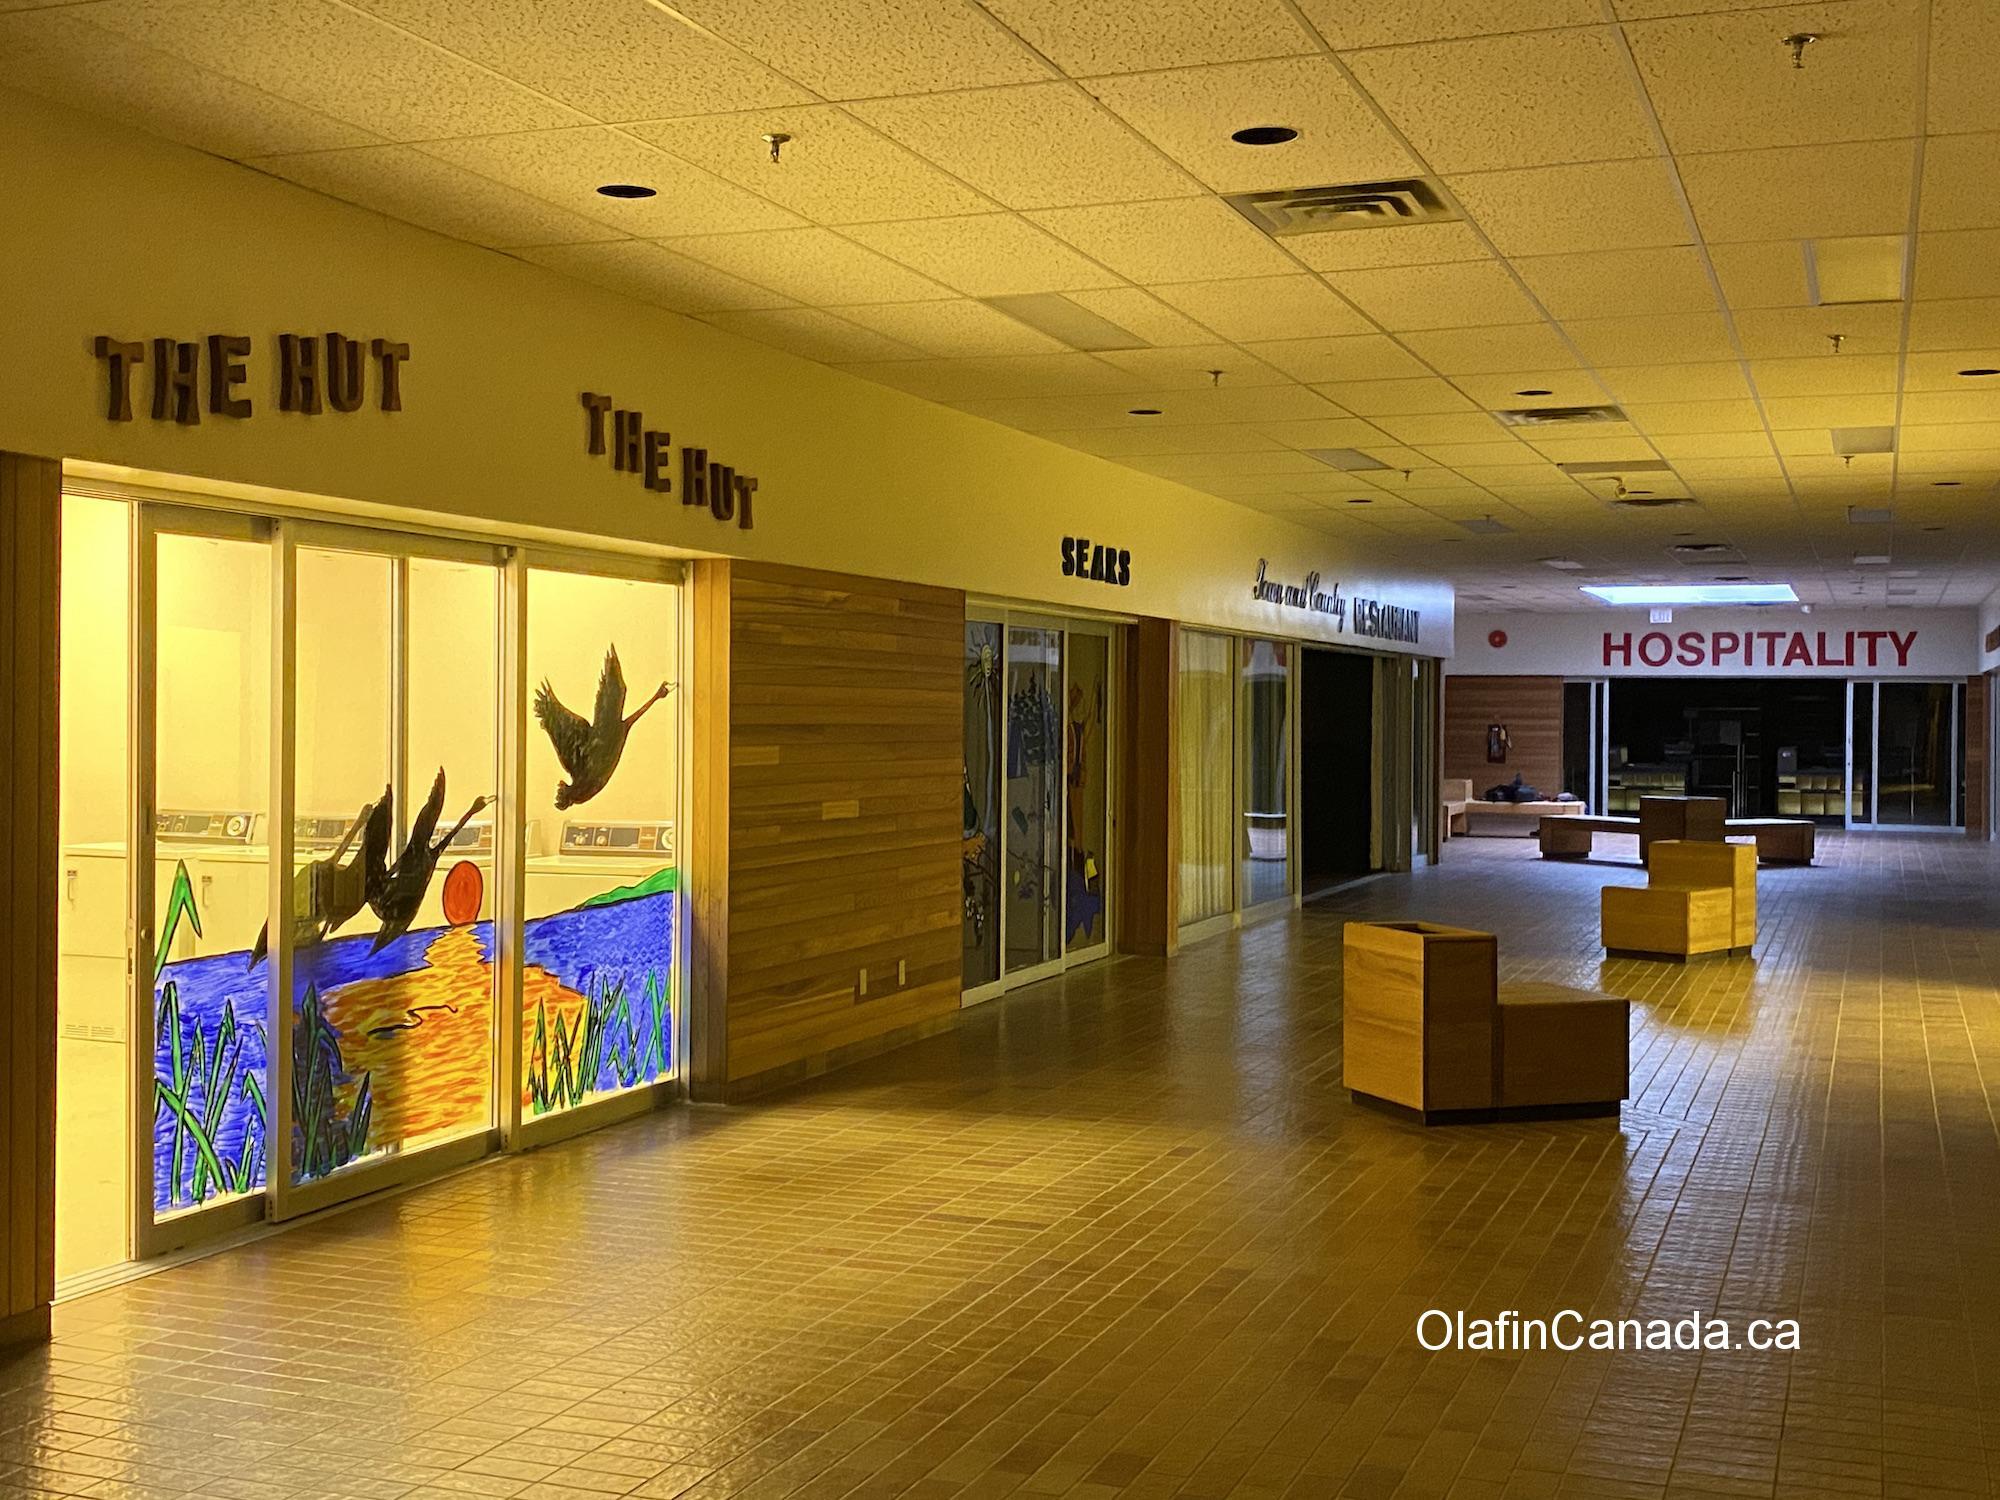 Mall in Kitsault with supermarket, pub and post office #olafincanada #britishcolumbia #discoverbc #abandonedbc #kitsault